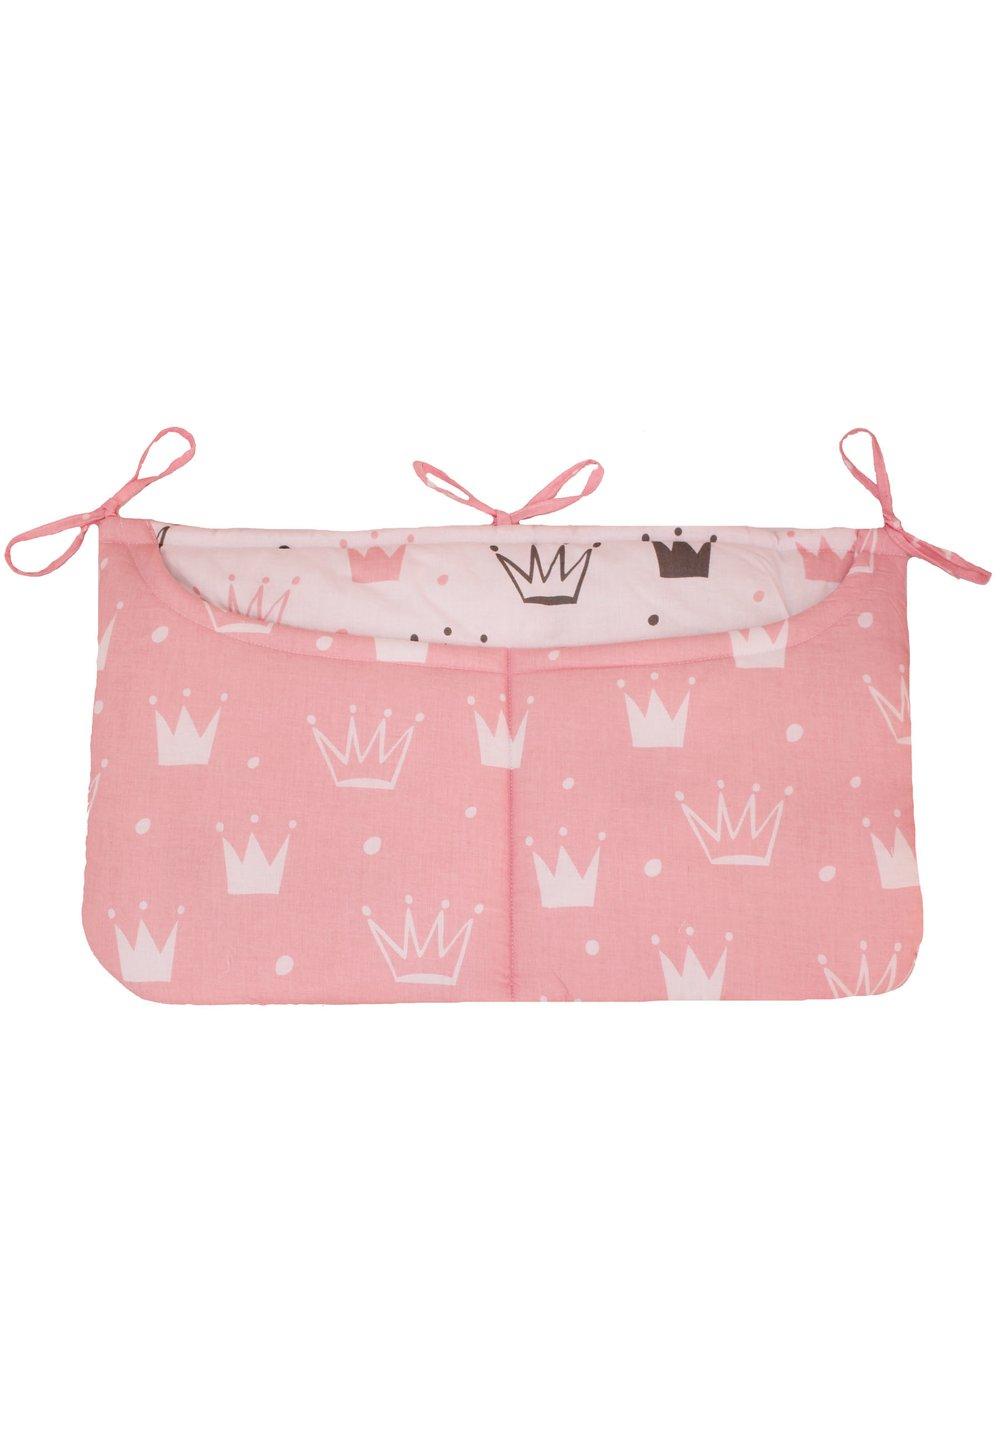 Buzunar patut, coronite Princess roz, 60 x 40 imagine